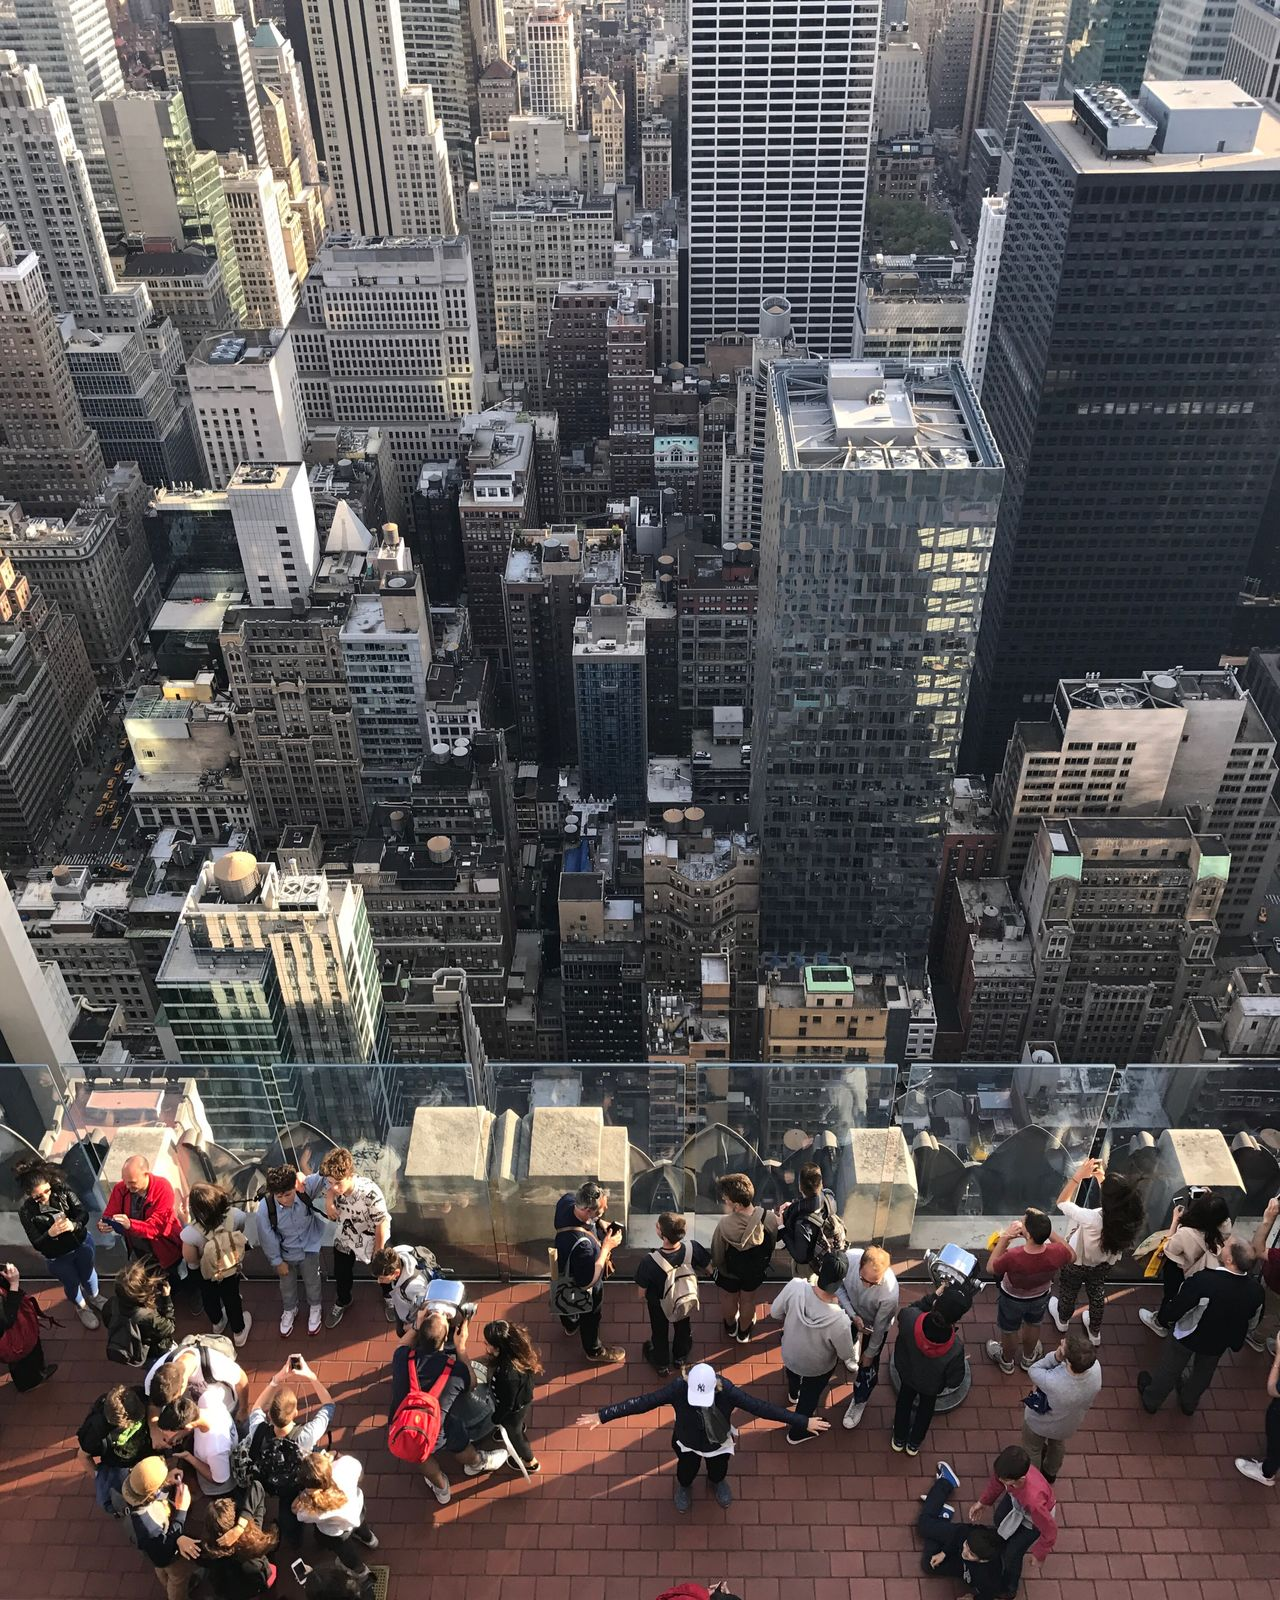 Taking Photos Of Tourists Posing Birdseyeview Topview Rockefeller Center Topoftherock View Buildings Skyscraper Architecture City Urban Manhattan NYC Newyork